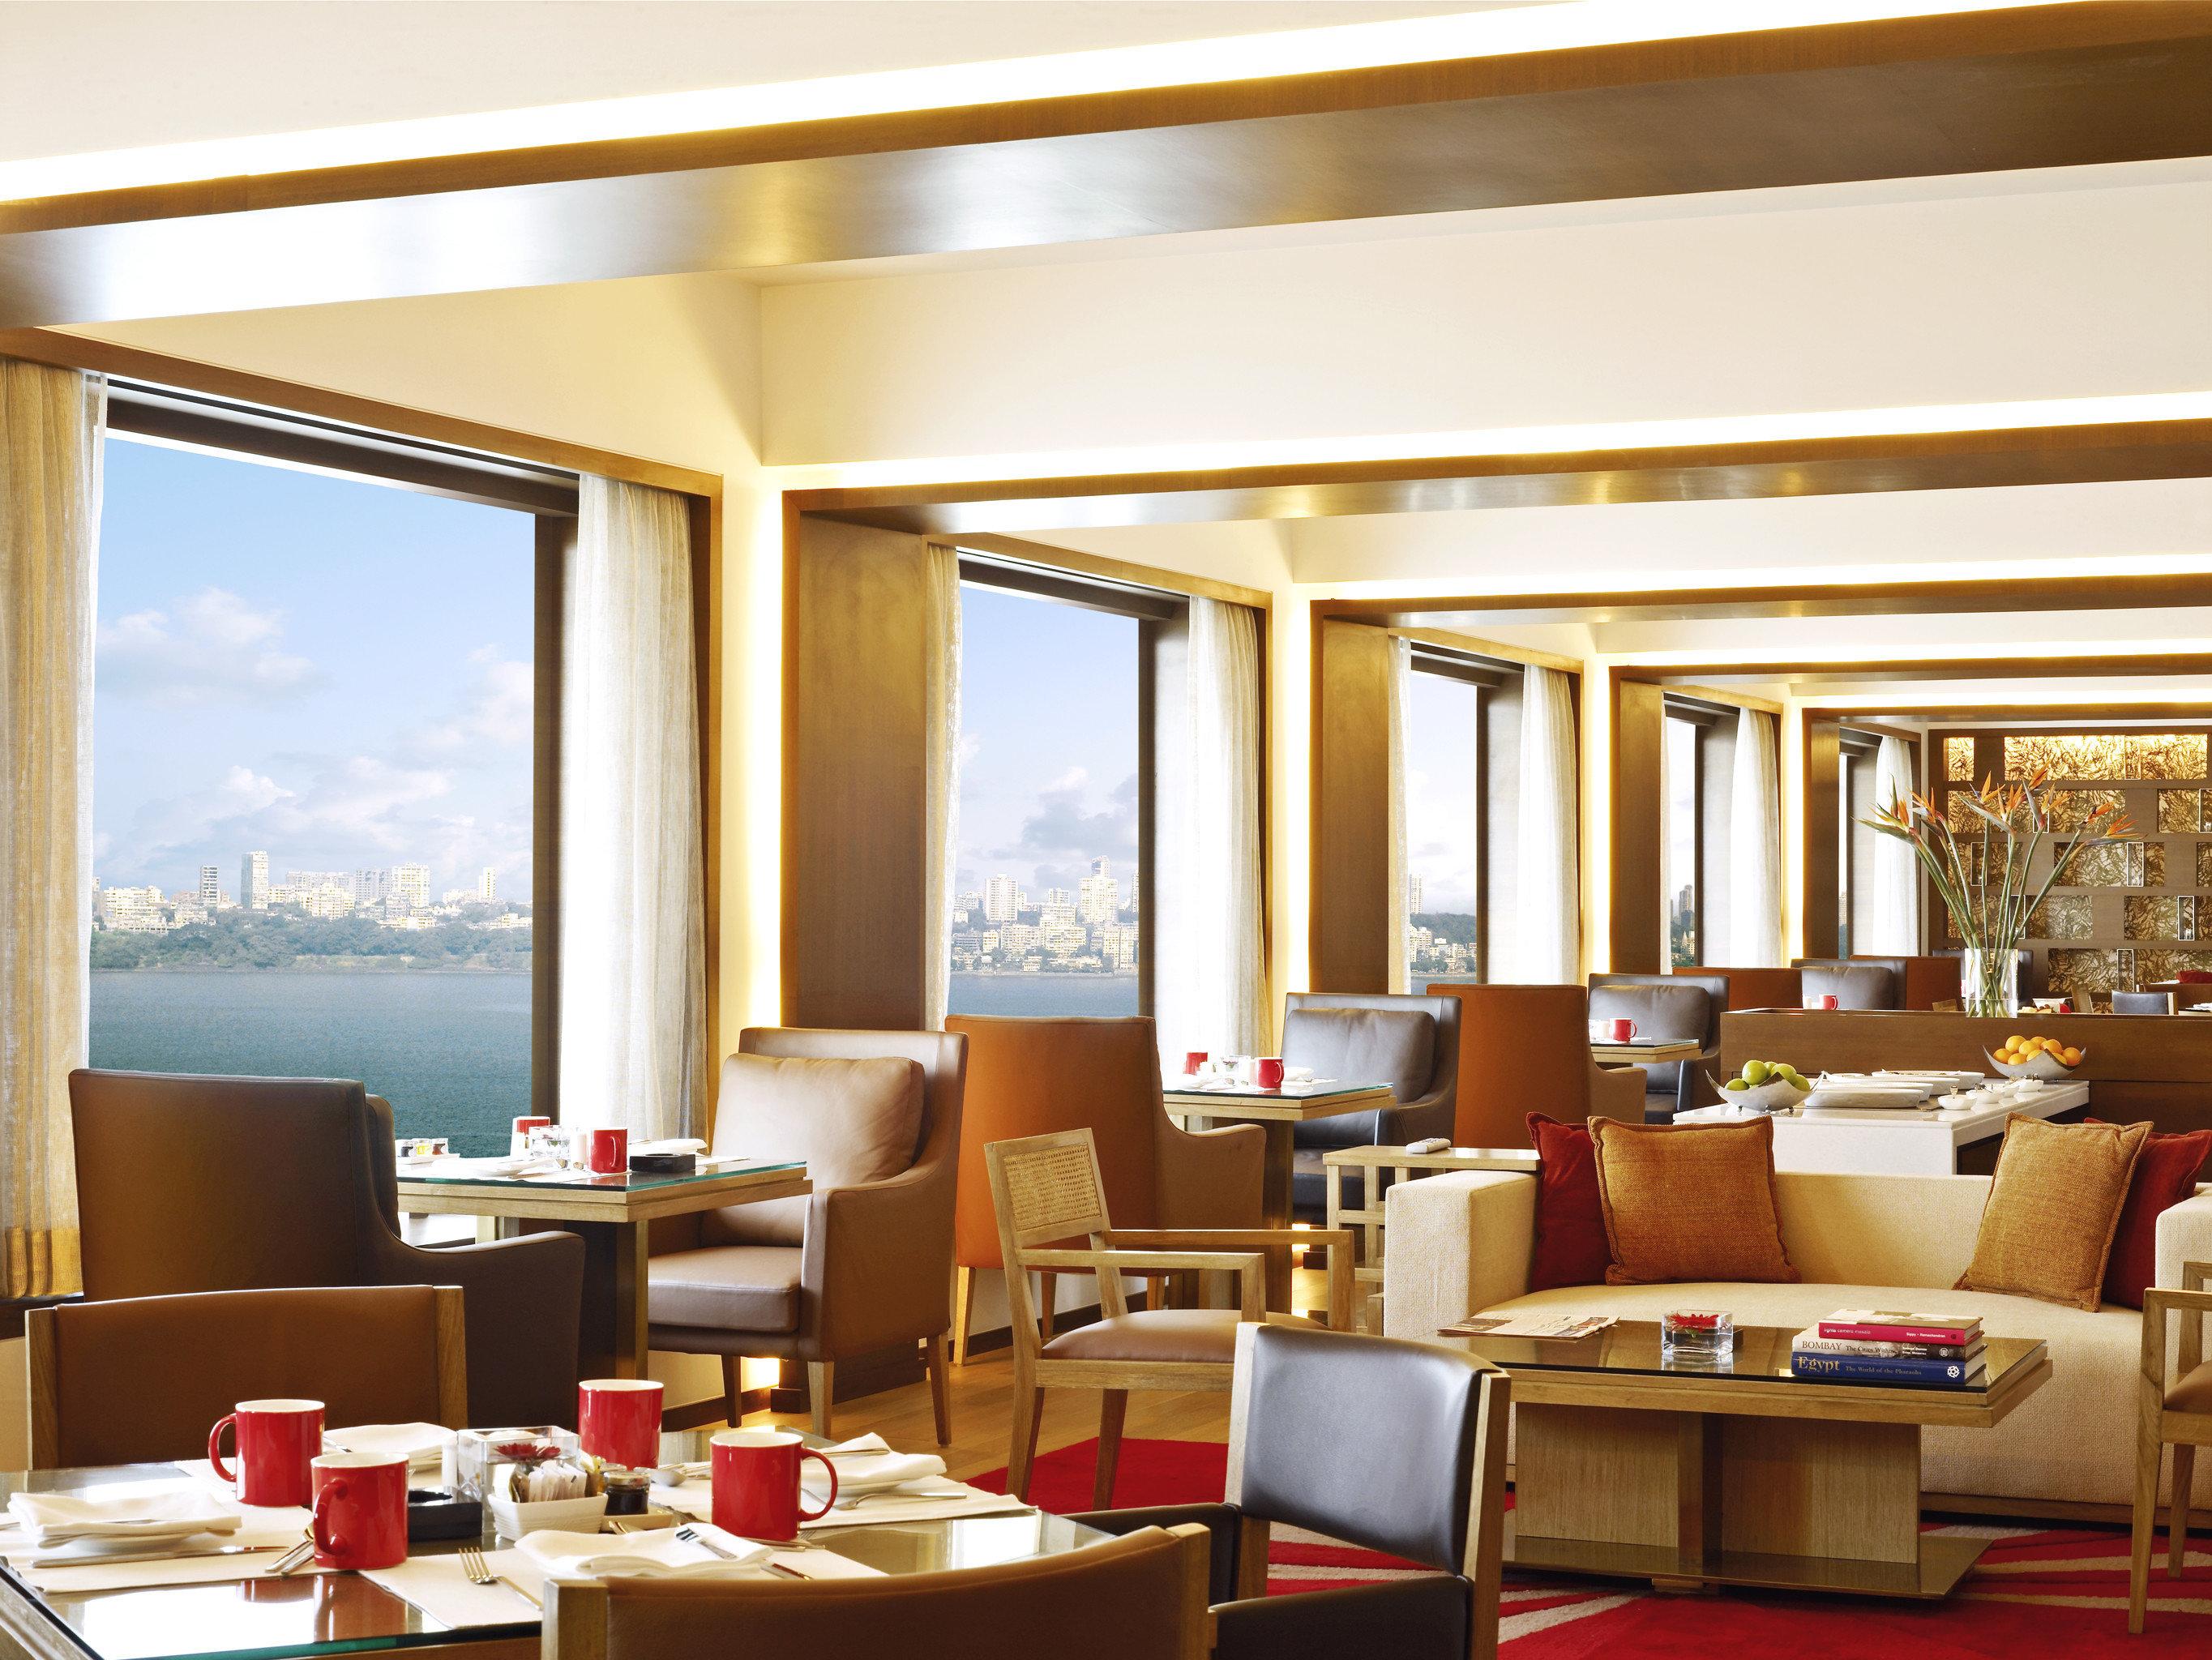 City Dining Drink Eat Modern Waterfront restaurant living room Suite condominium Resort